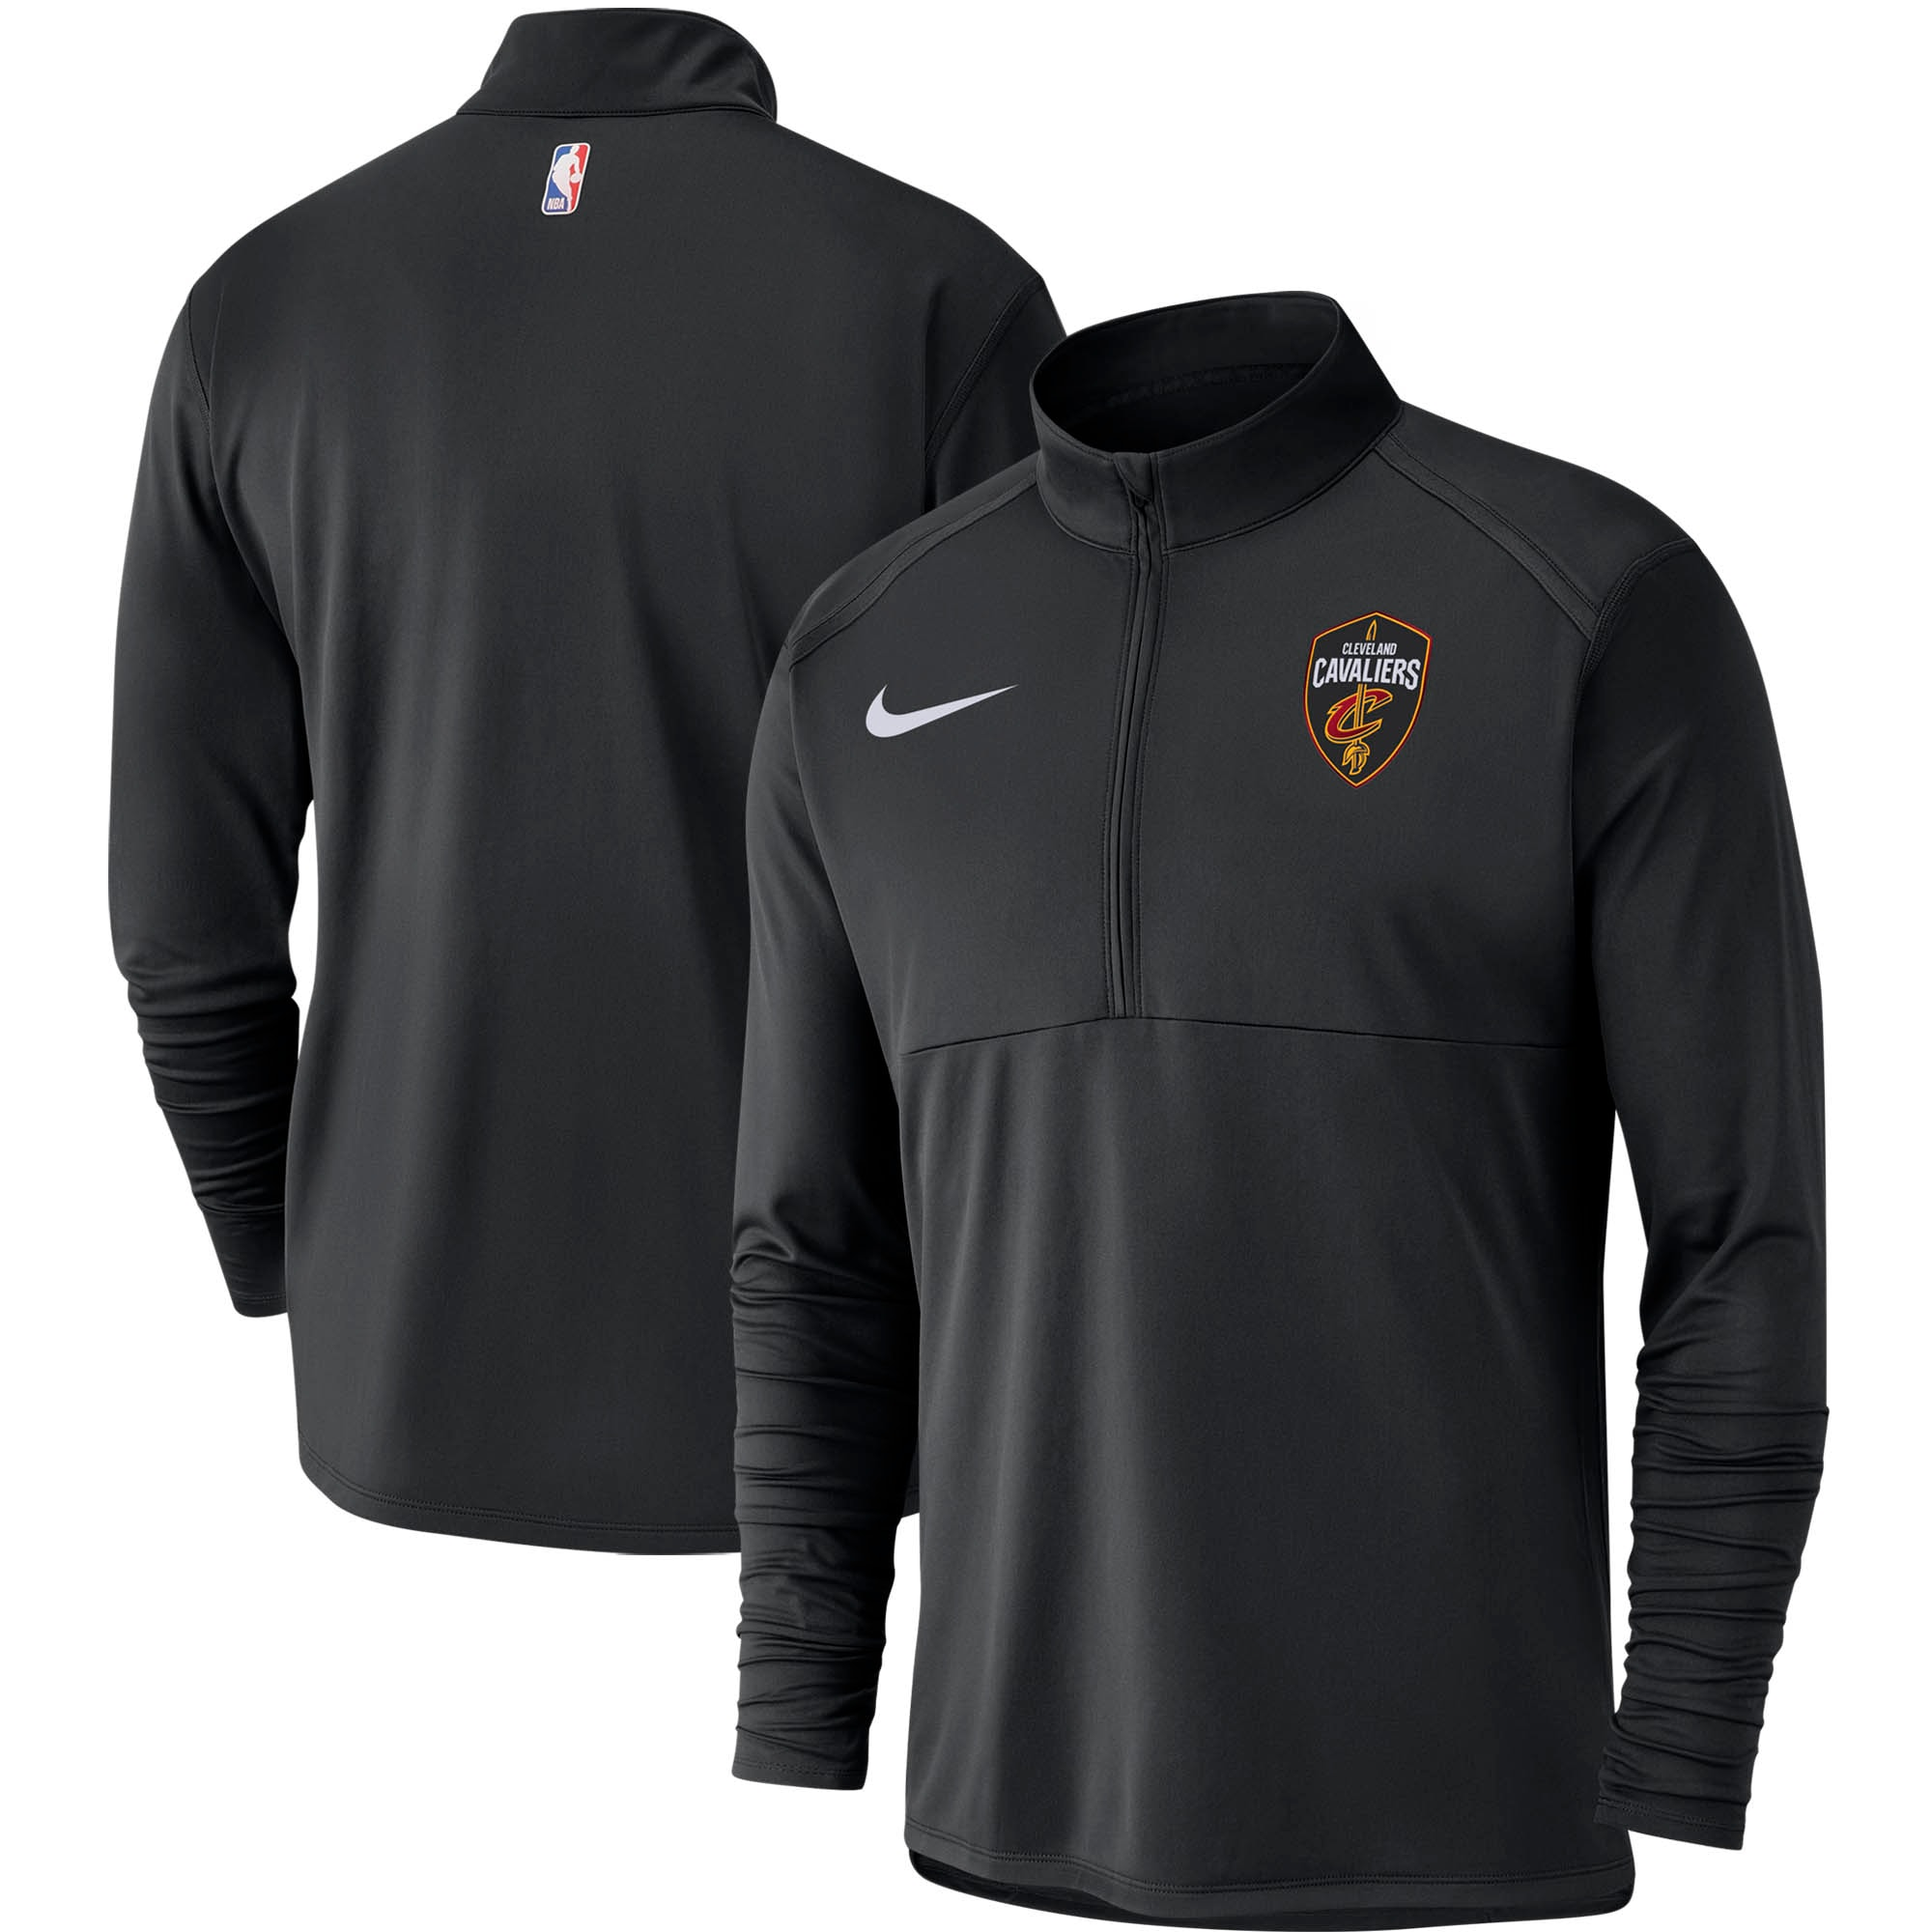 Cleveland Cavaliers Nike Element Performance Half-Zip Pullover Jacket - Black